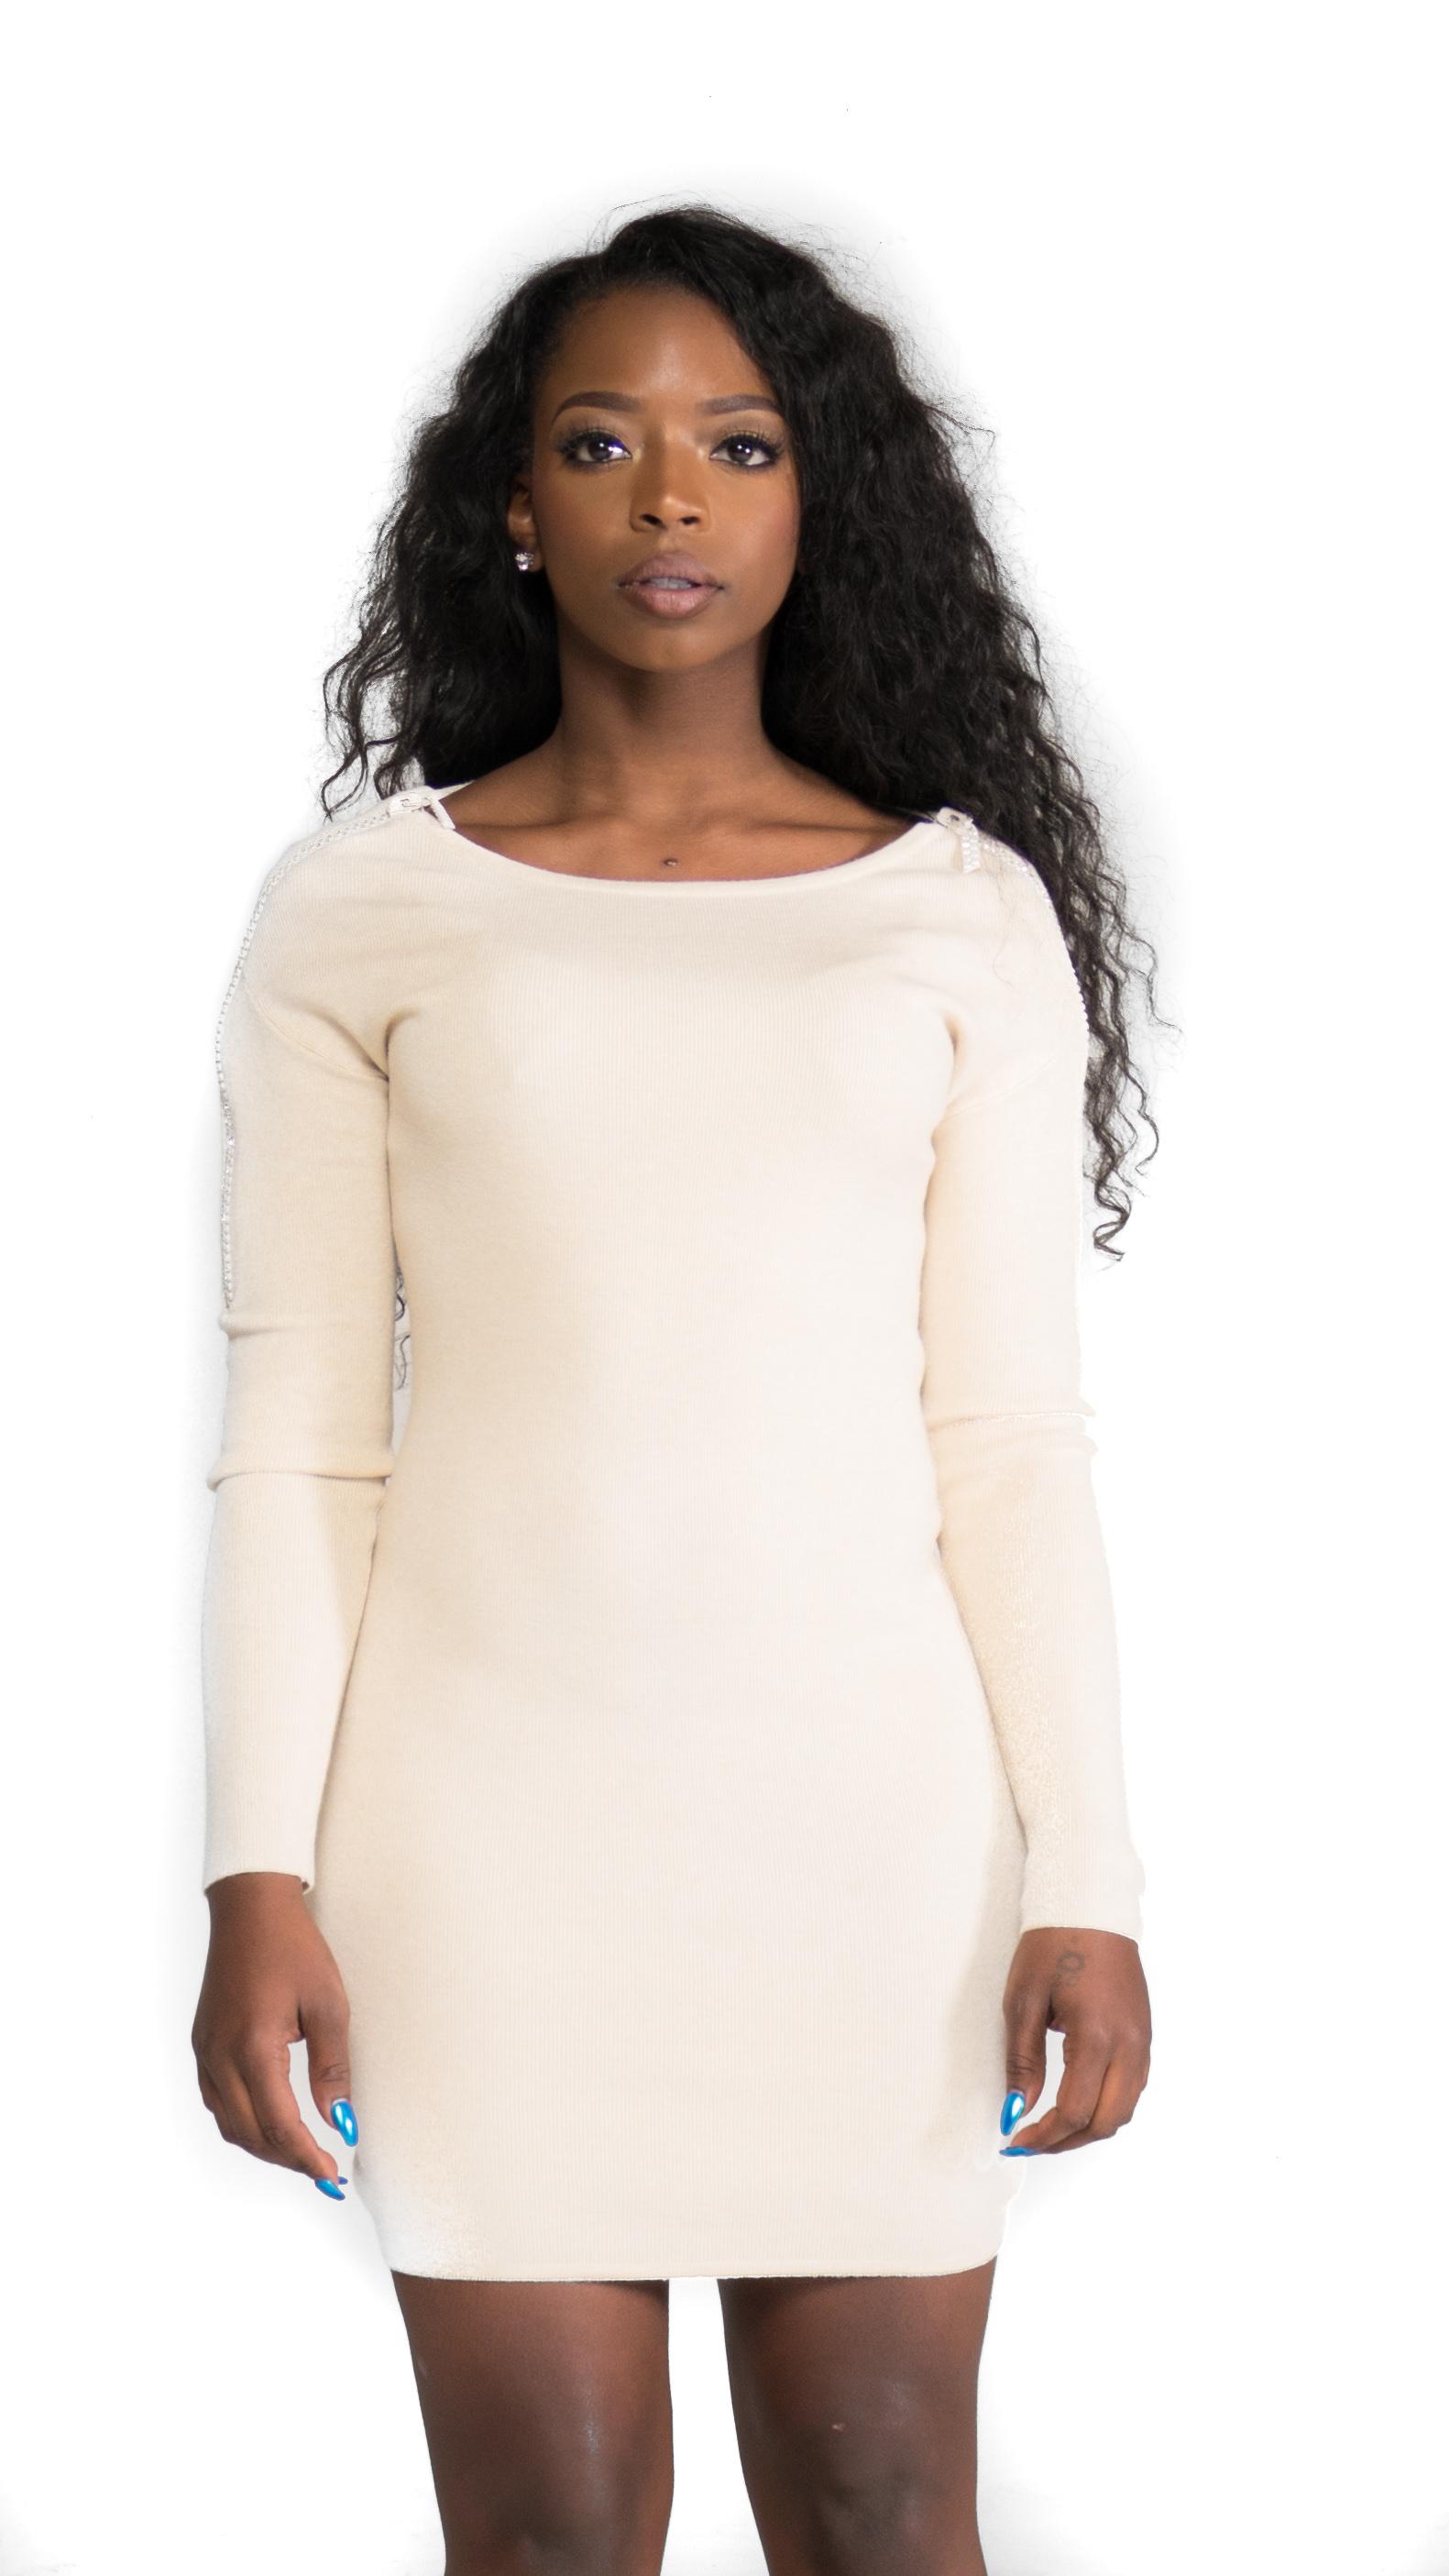 isis clothing - product shots-1580519.jpg